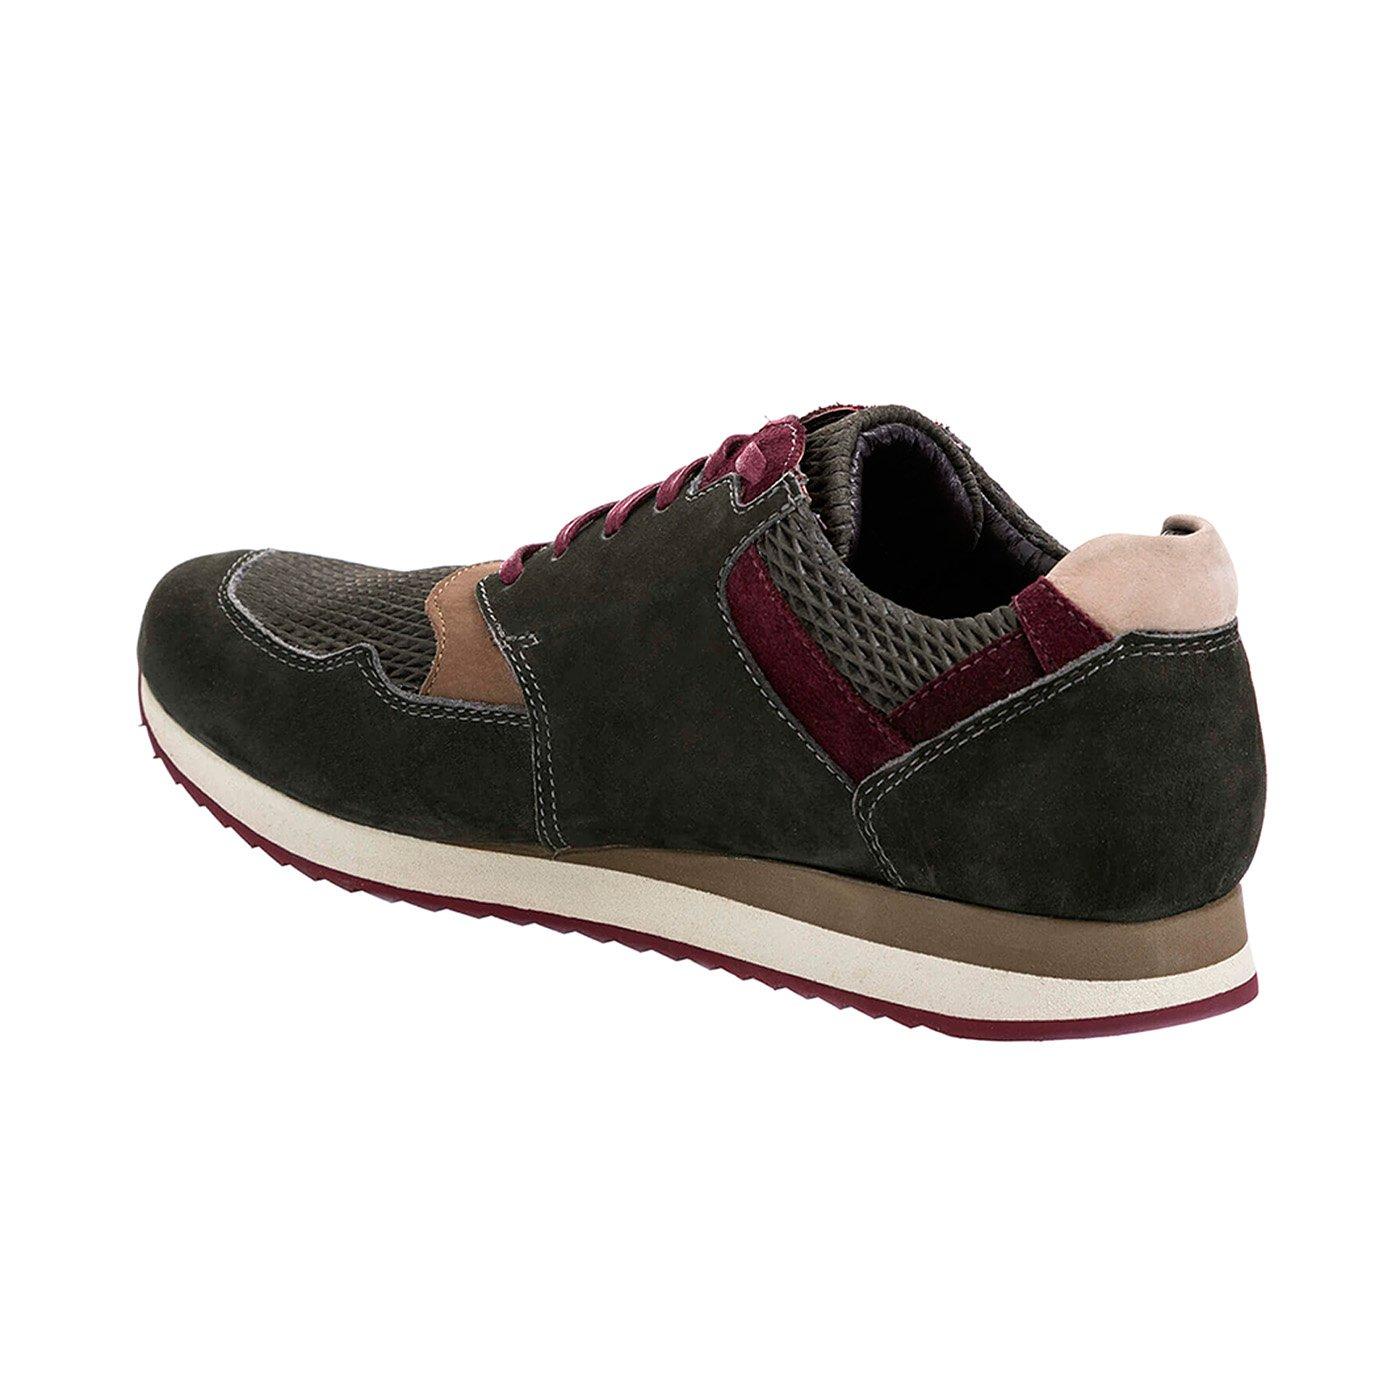 Amazon.com: VÉLEZ Genuine Colombian Leather Sneakers For Men | Zapatos Deportivos De Cuero: Clothing